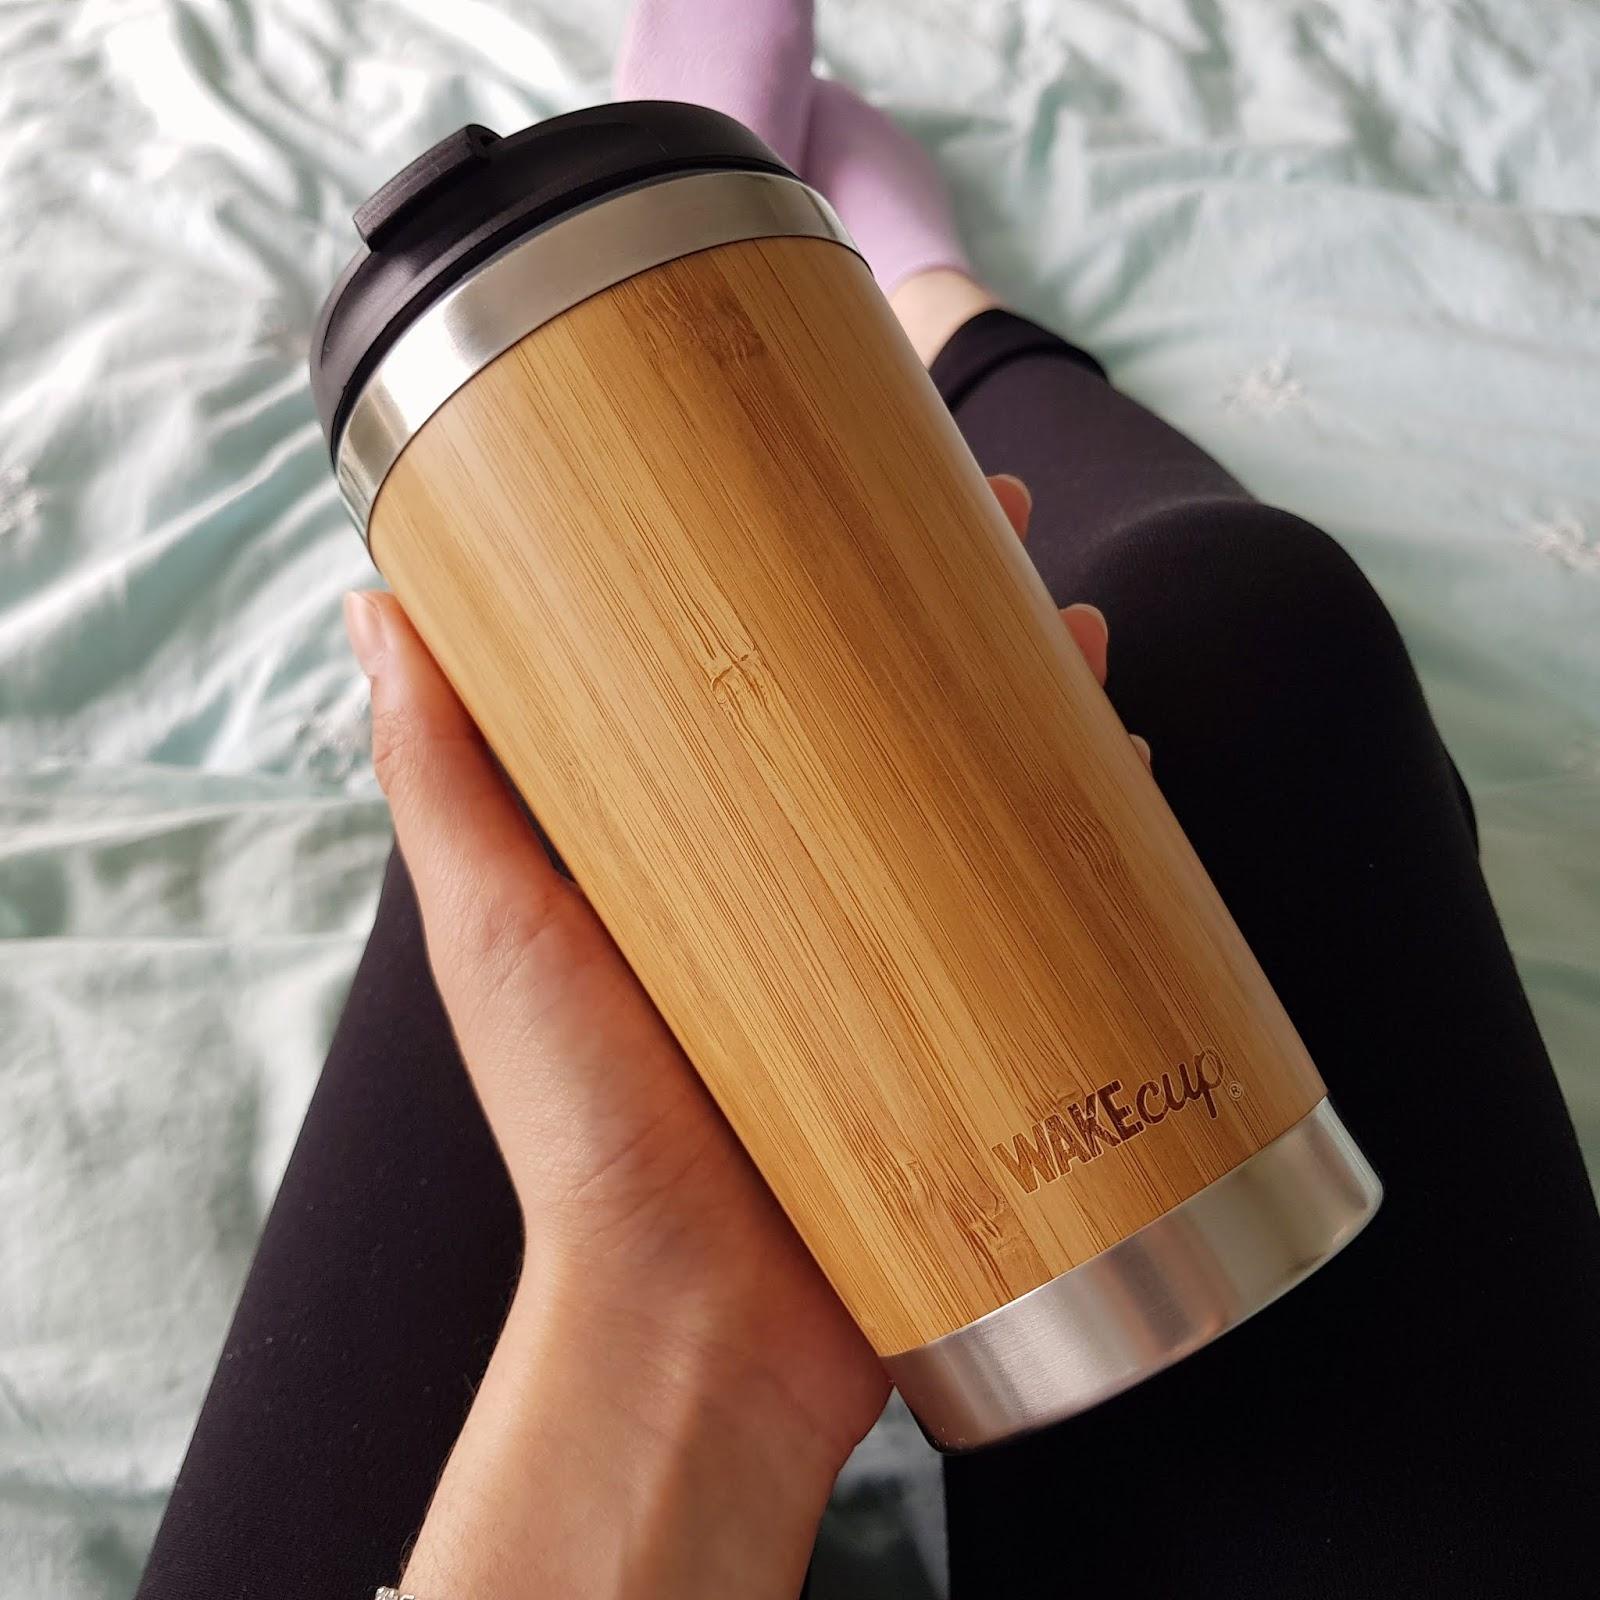 WAKEcup travel mug